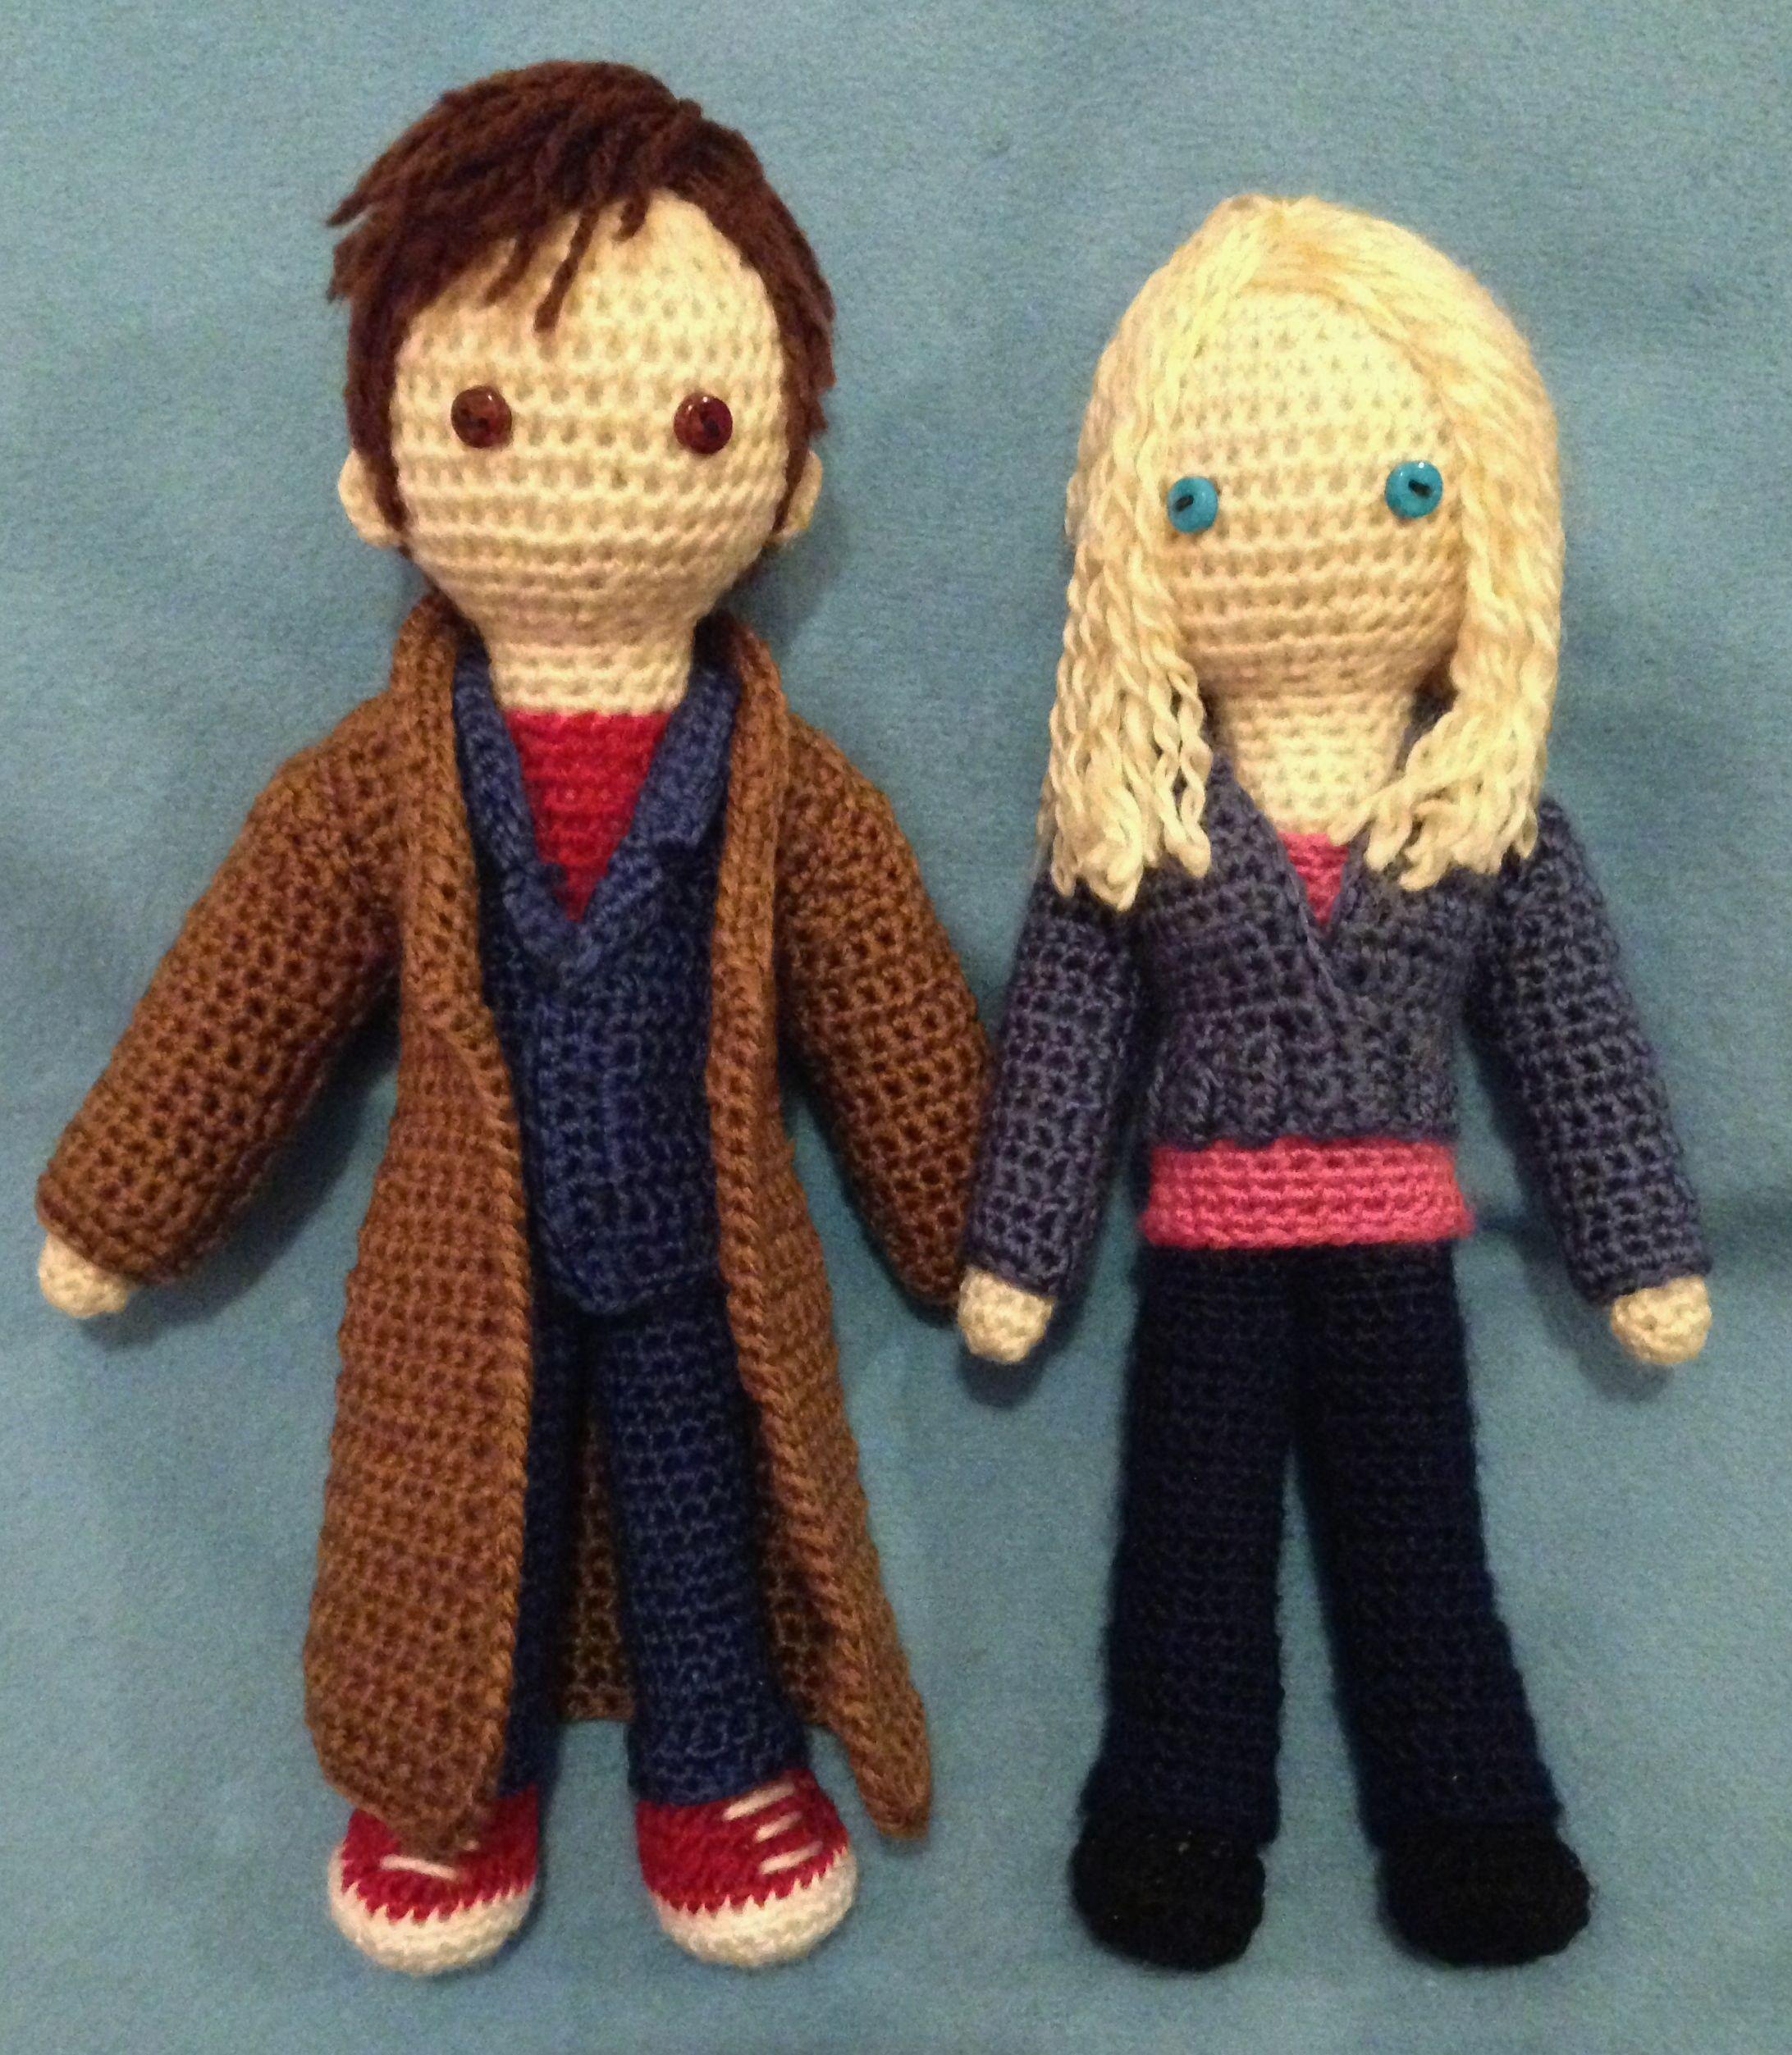 Doctor Who amigurumi - The 10th Doctor and Rose   My Amigurumi ...